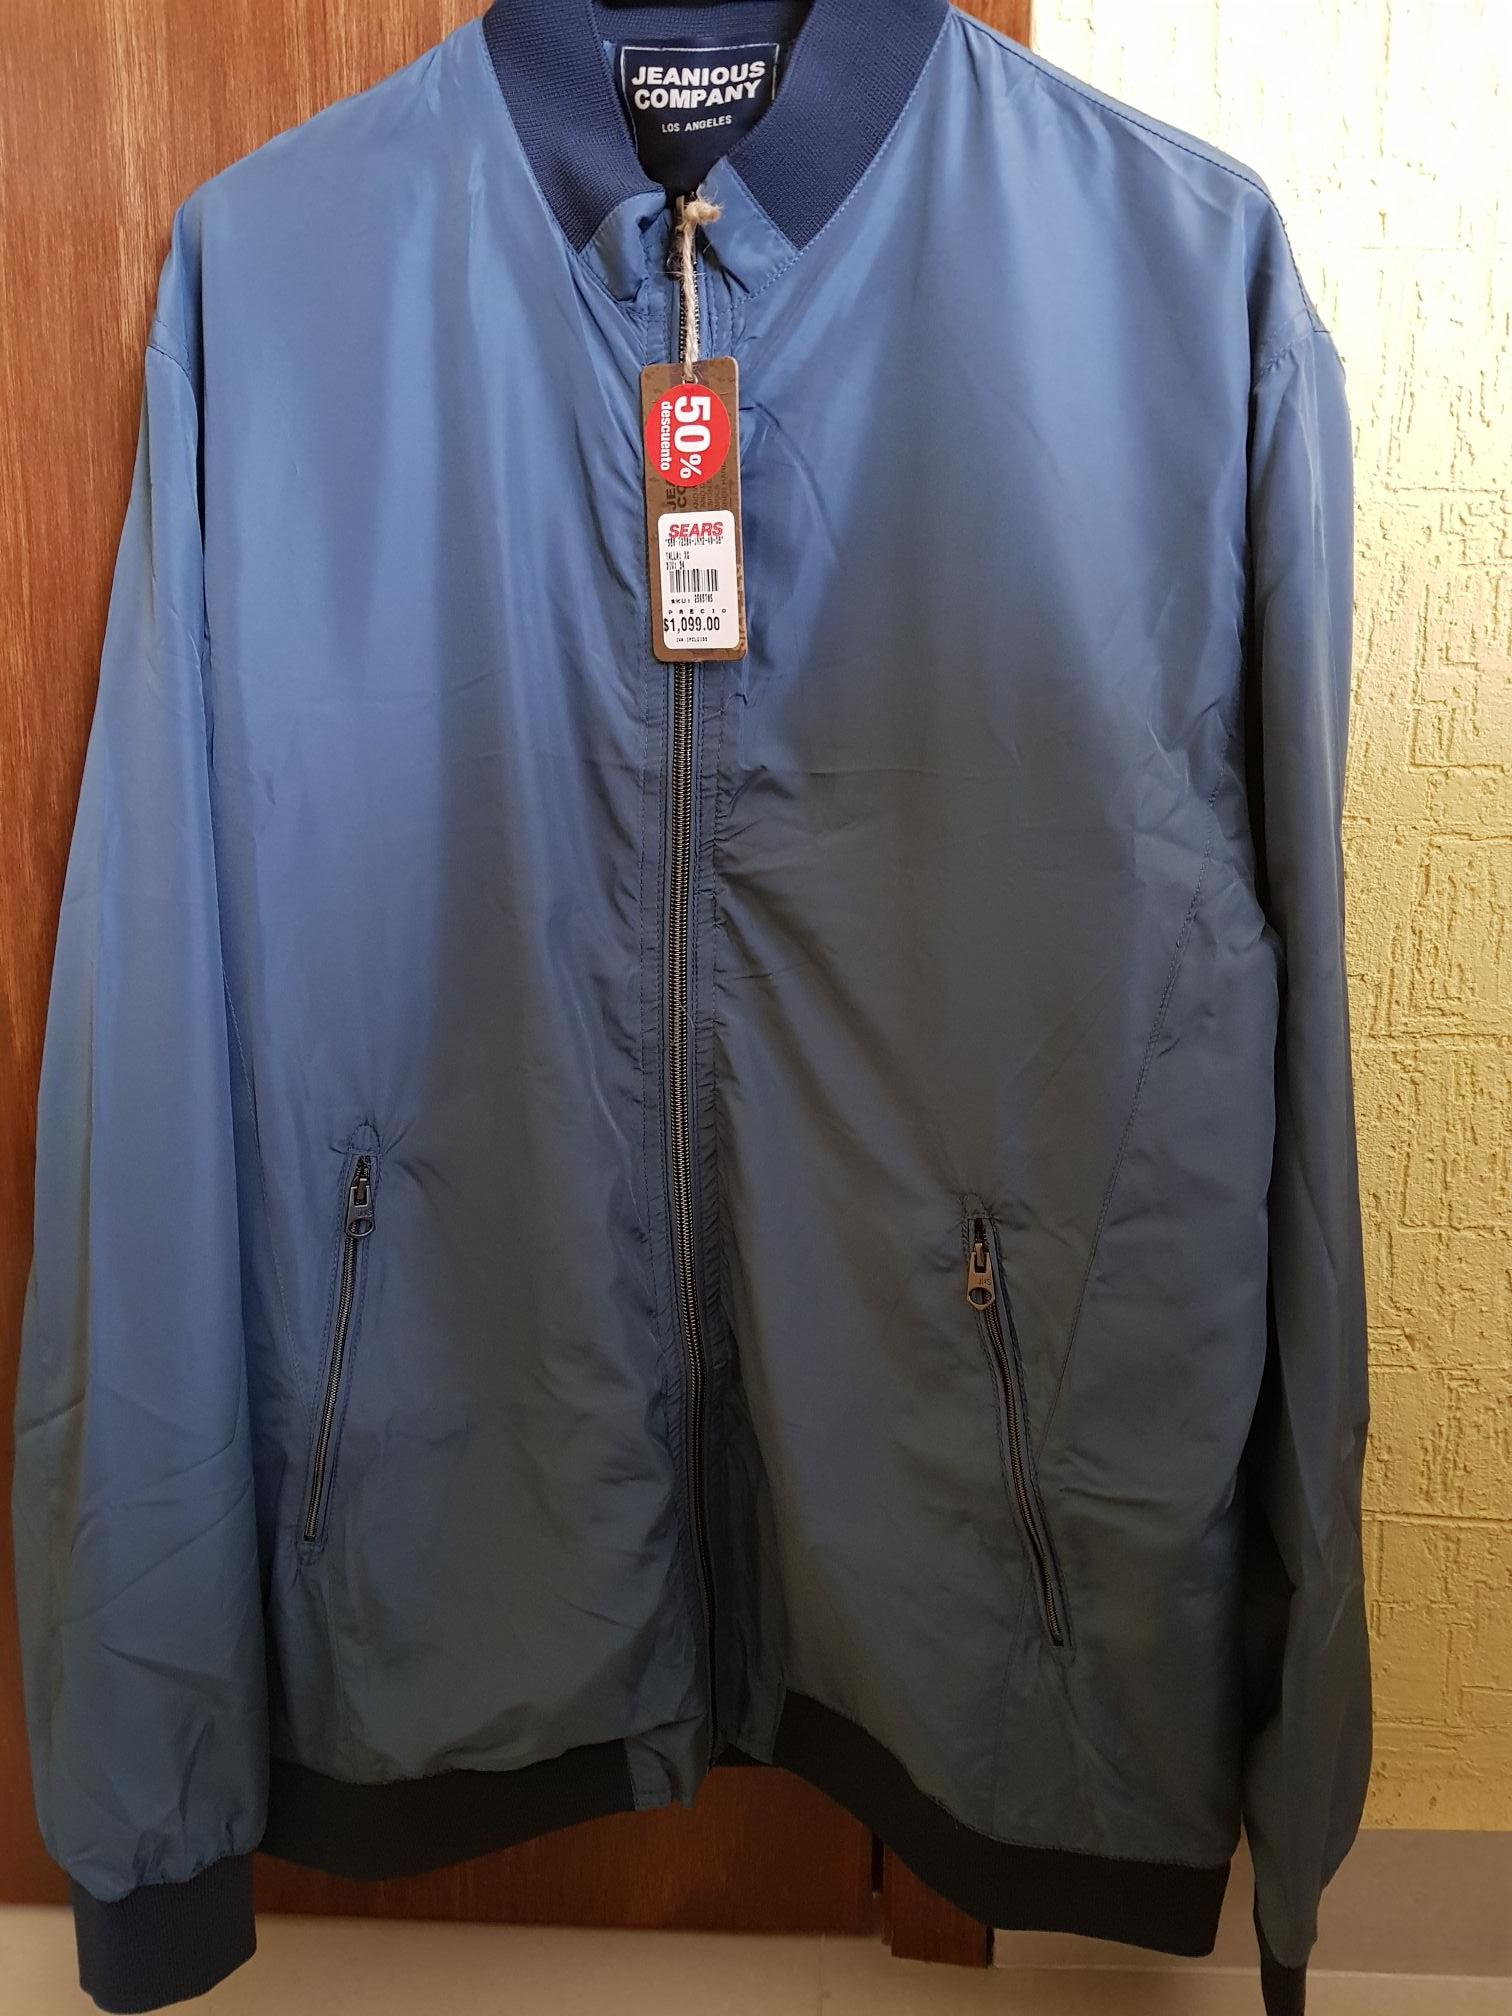 Sears Buenavista CDMX: Chamarra Jeanious Company de $1099 a $396